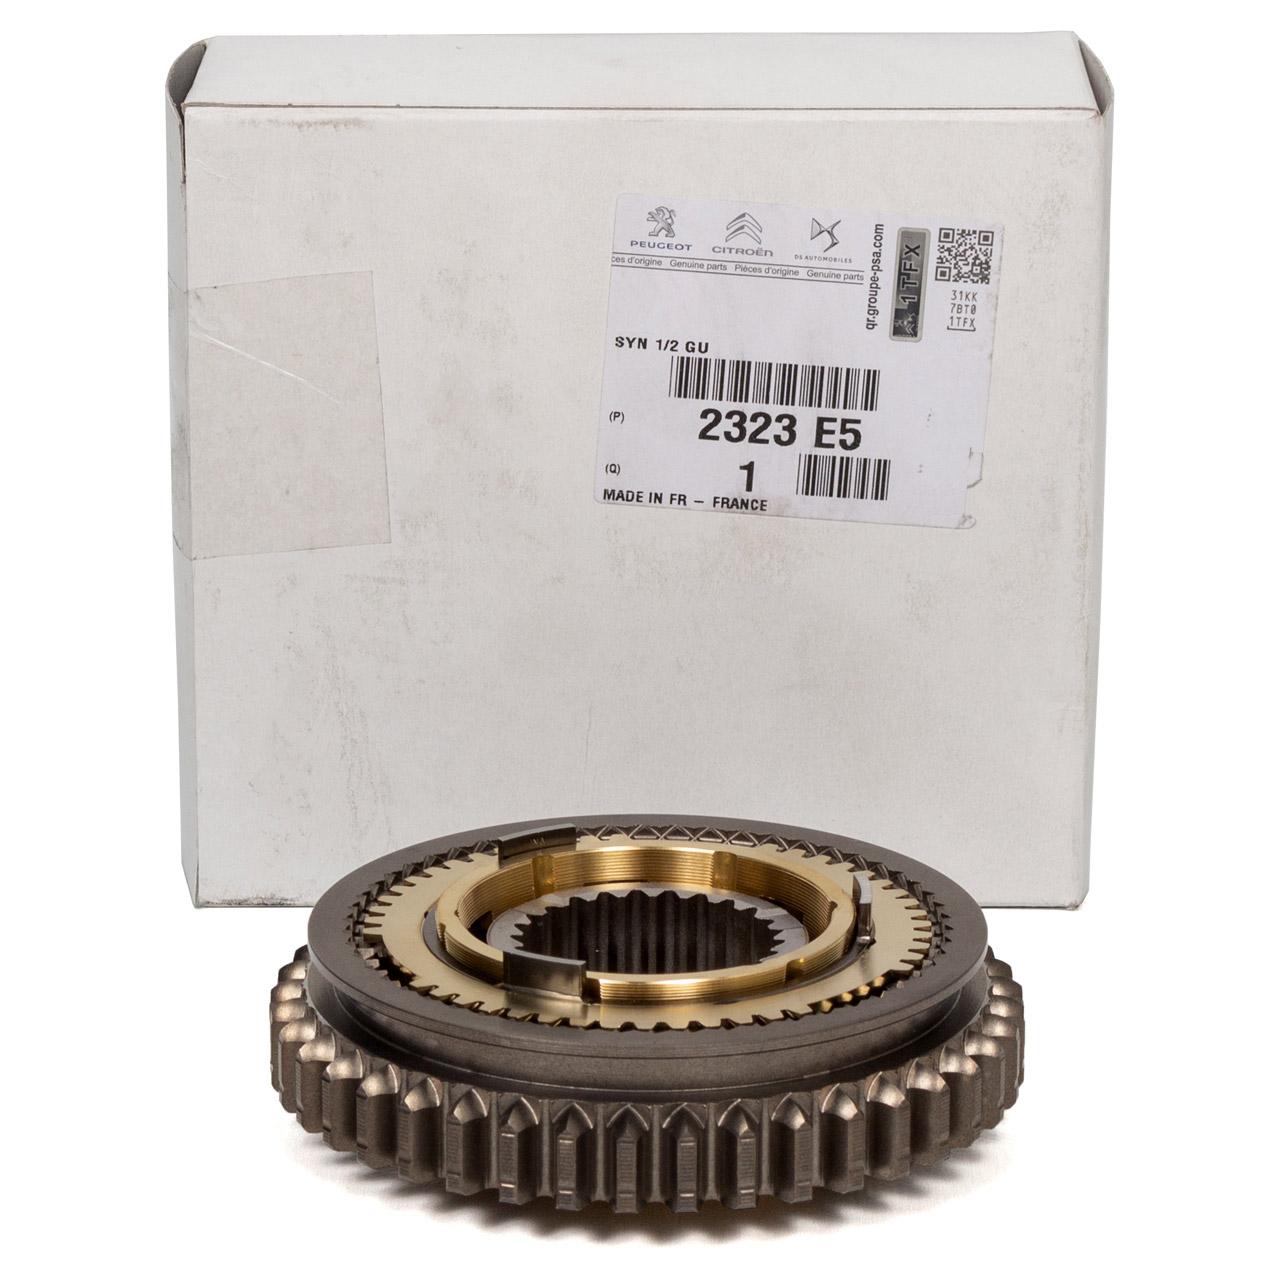 ORIGINAL PSA Synchronring MLGUC14 MLGU6C15N MLGU Schaltgetriebe 2323.E5